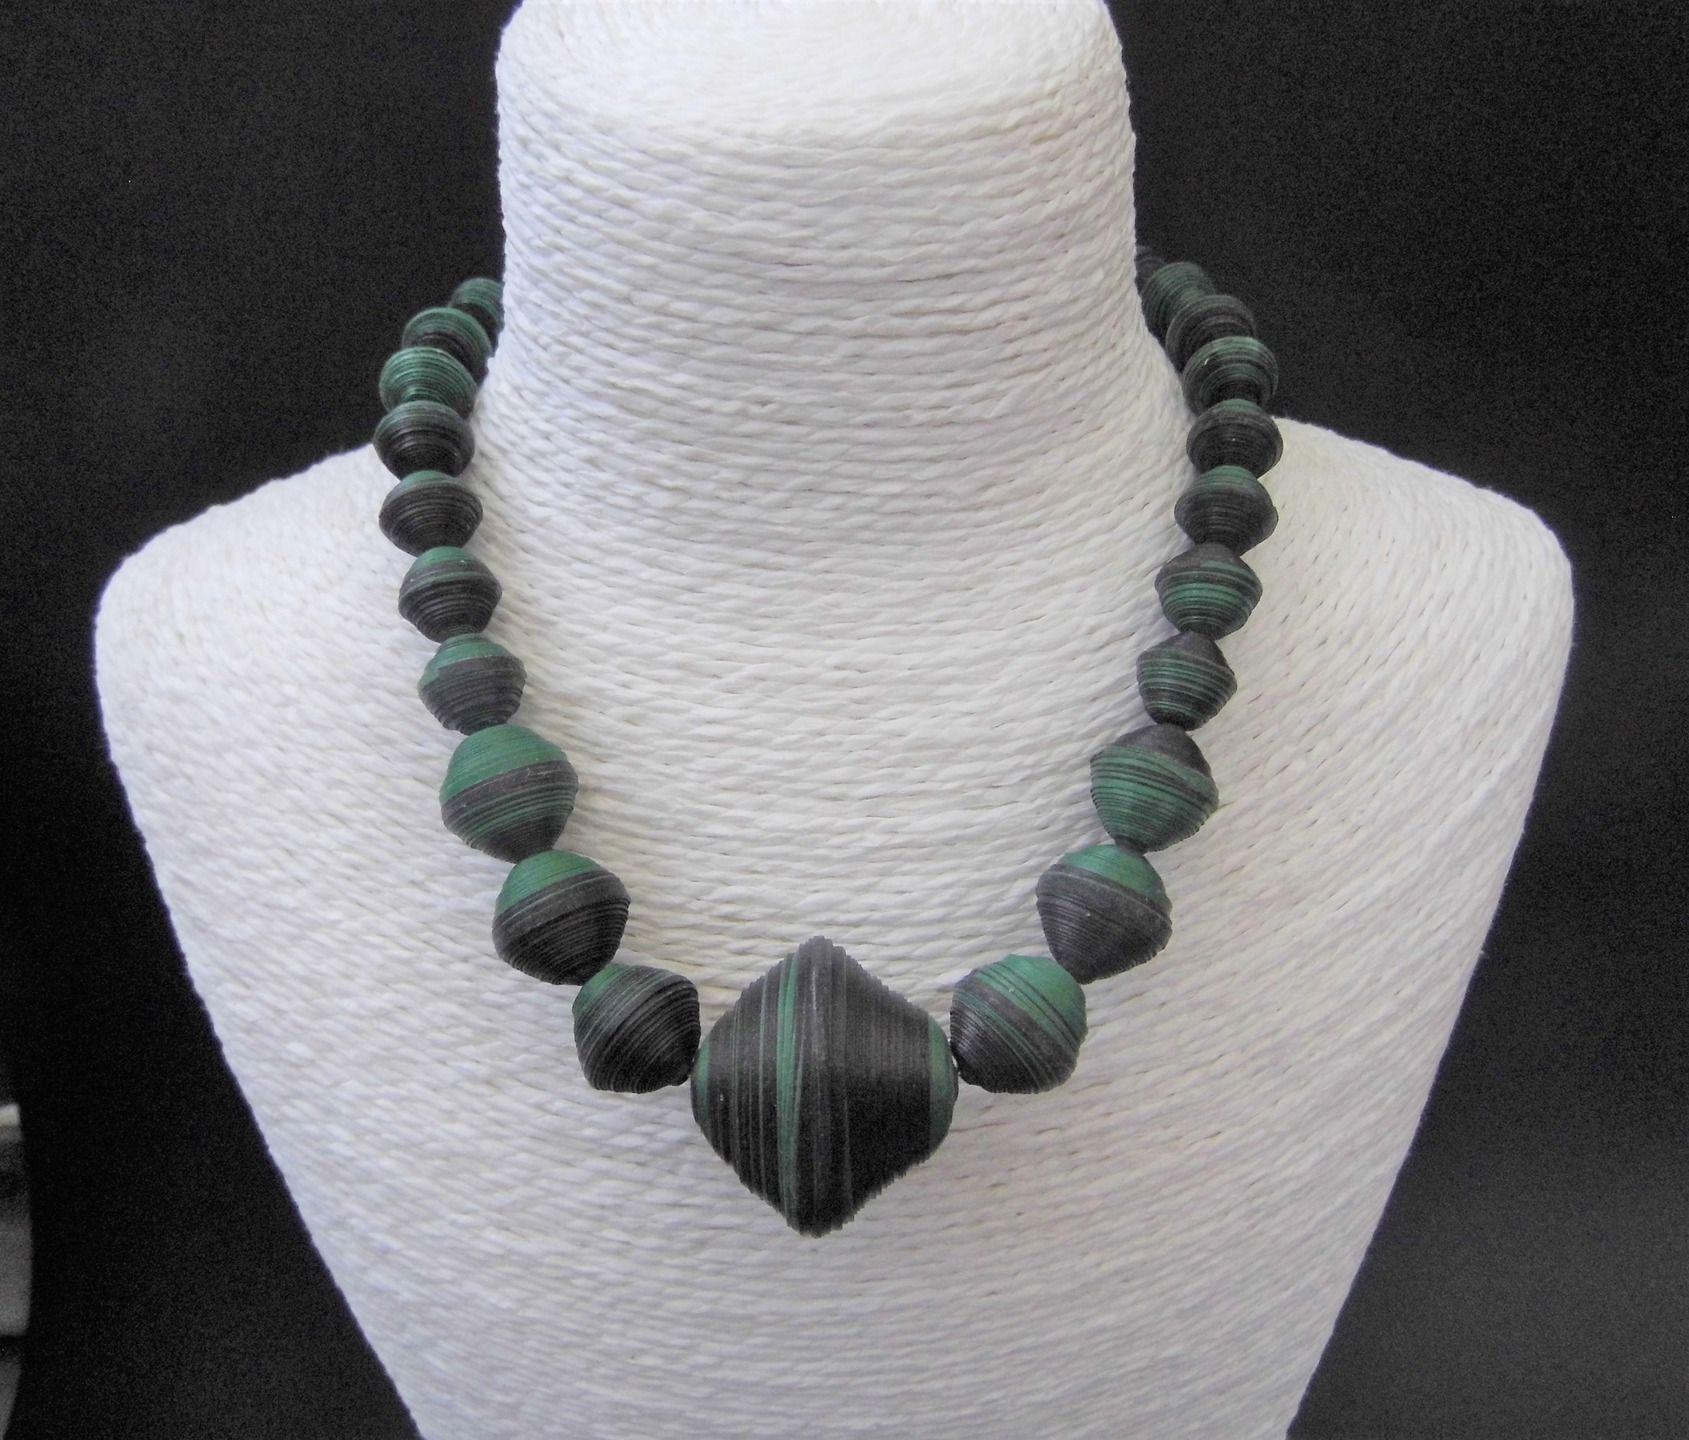 Fabriquer collier grosses perles